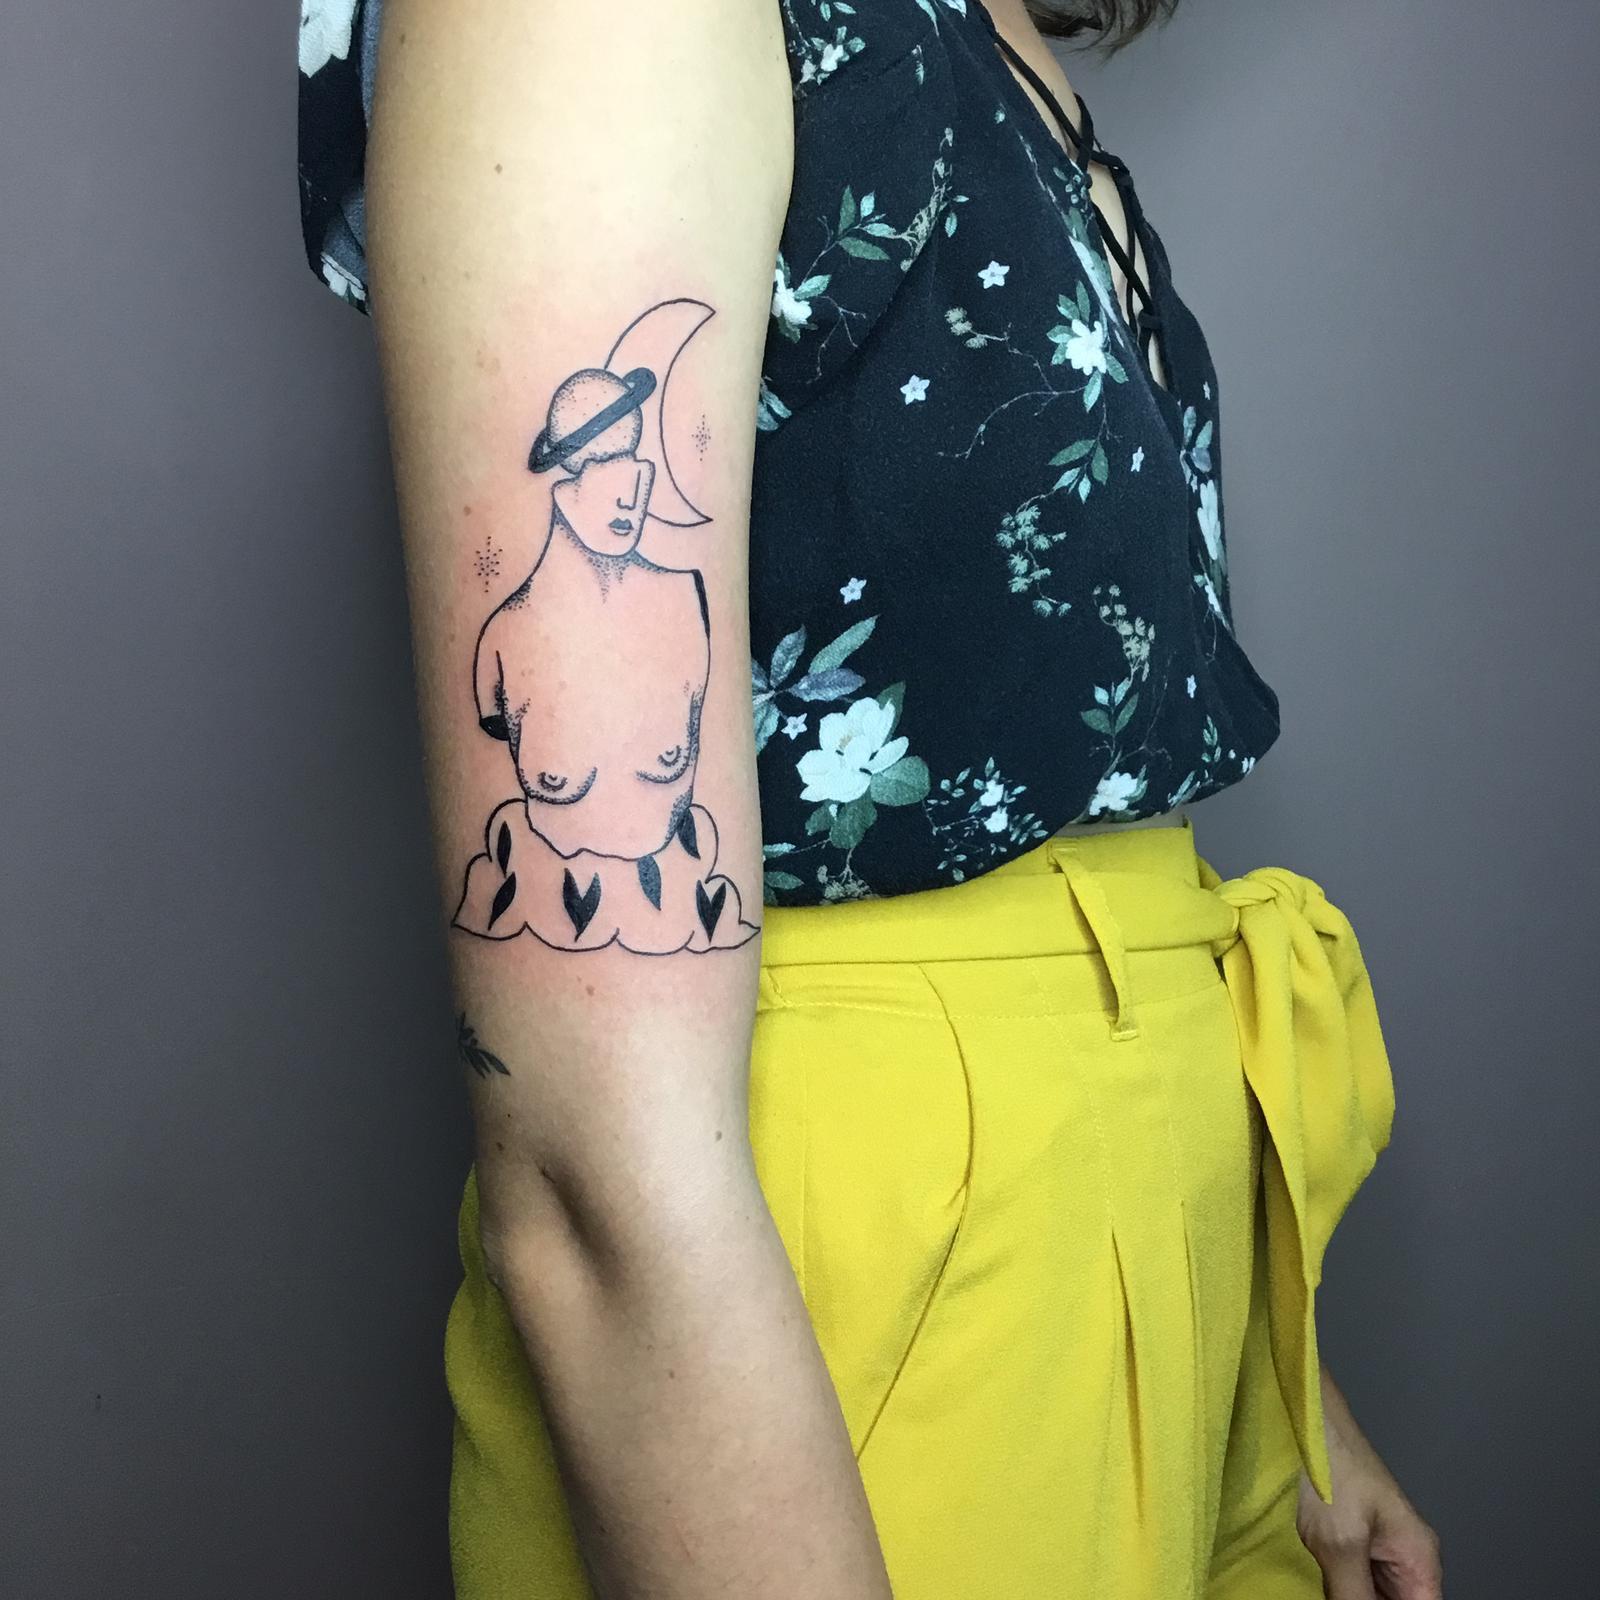 Lindelebile-tatouages-natures-floraux-st